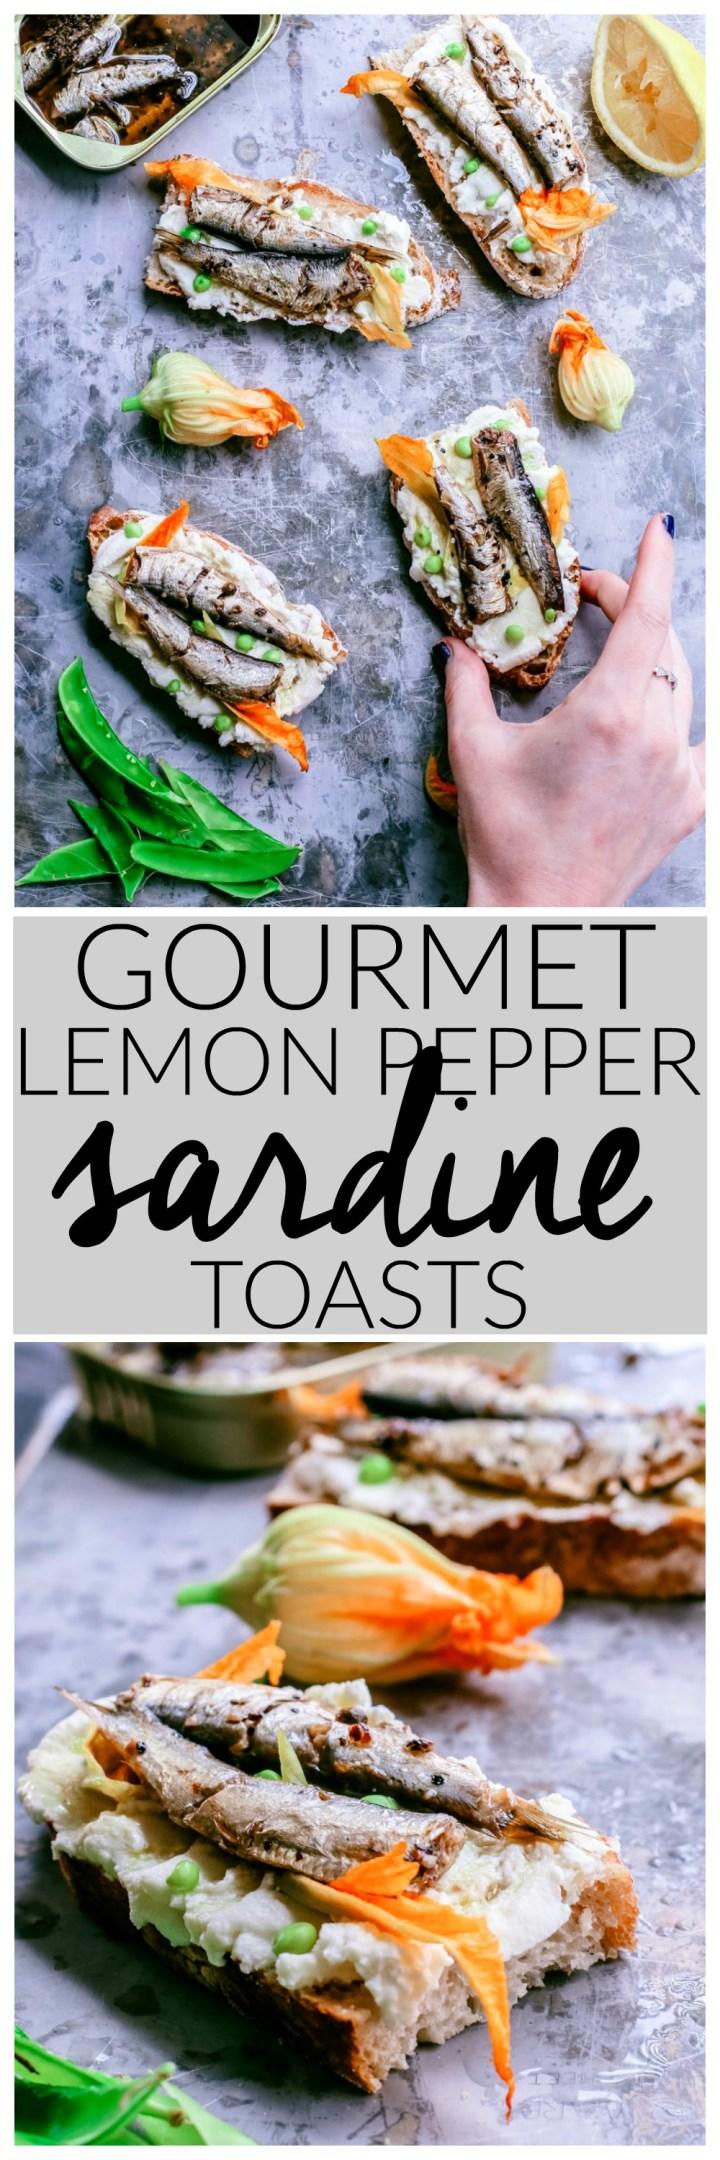 Gourmet Lemon Pepper Sardine Toasts | Killing Thyme